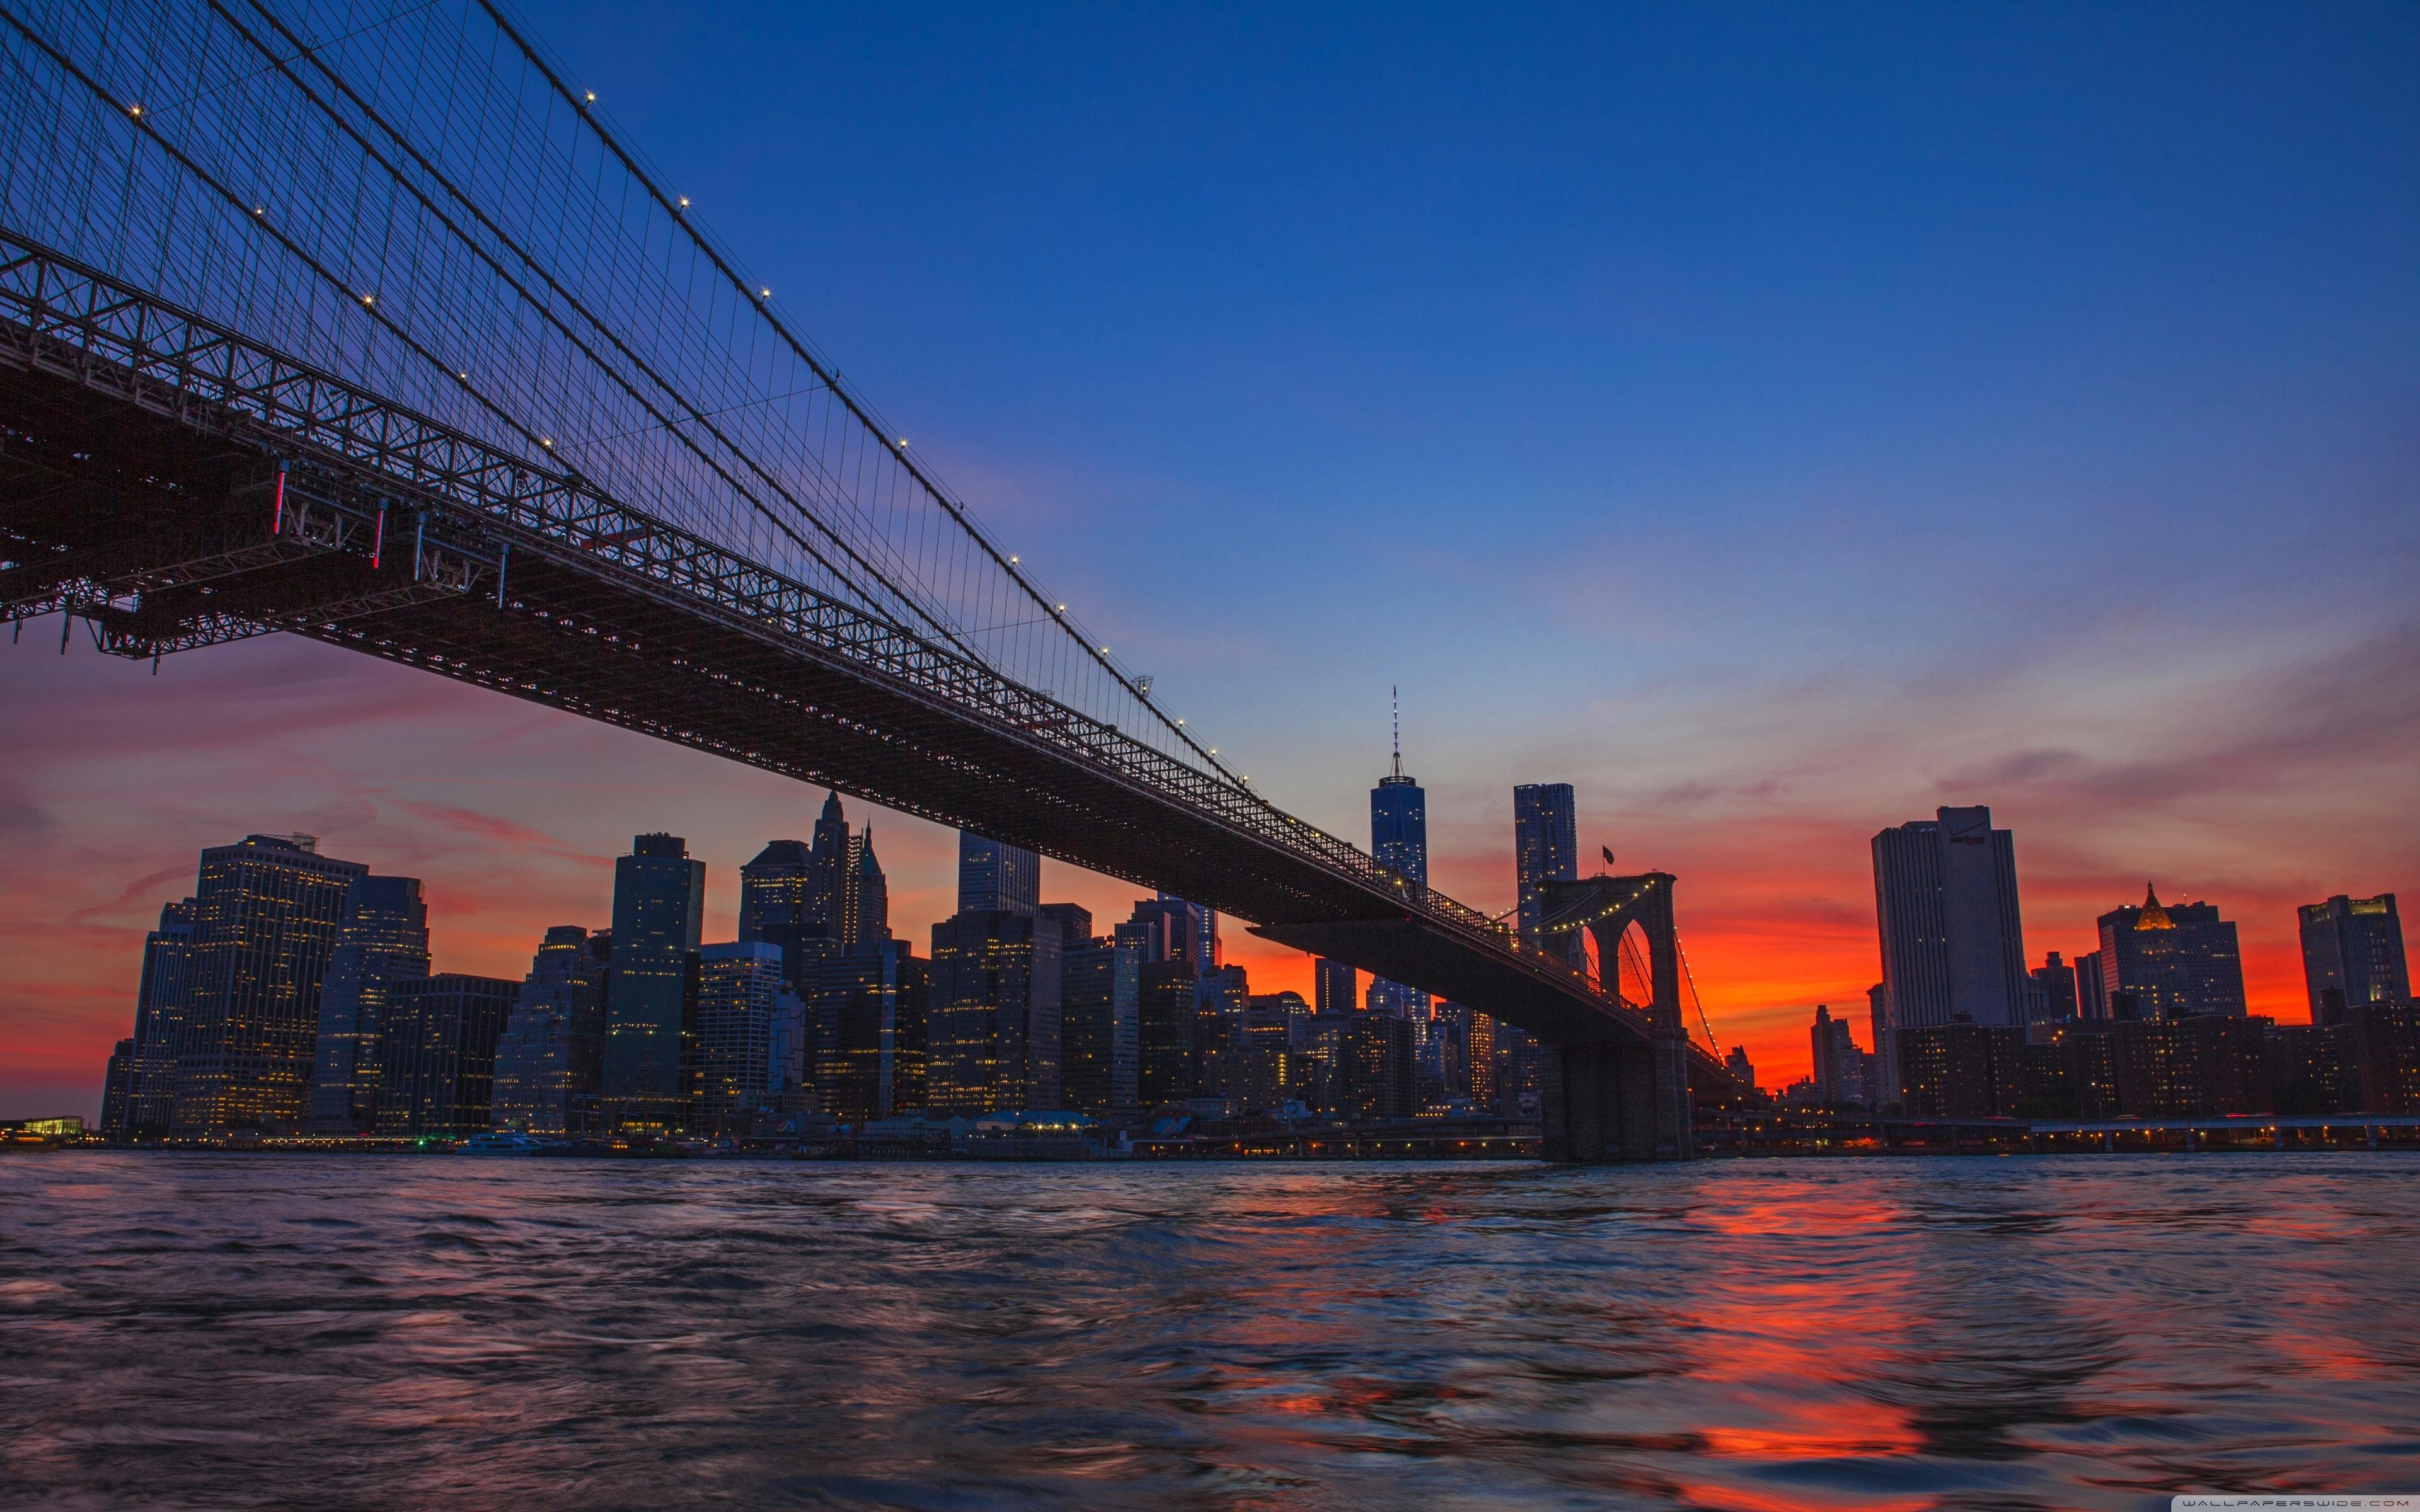 Free Download New York City Brooklyn Bridge View 4k Hd Desktop